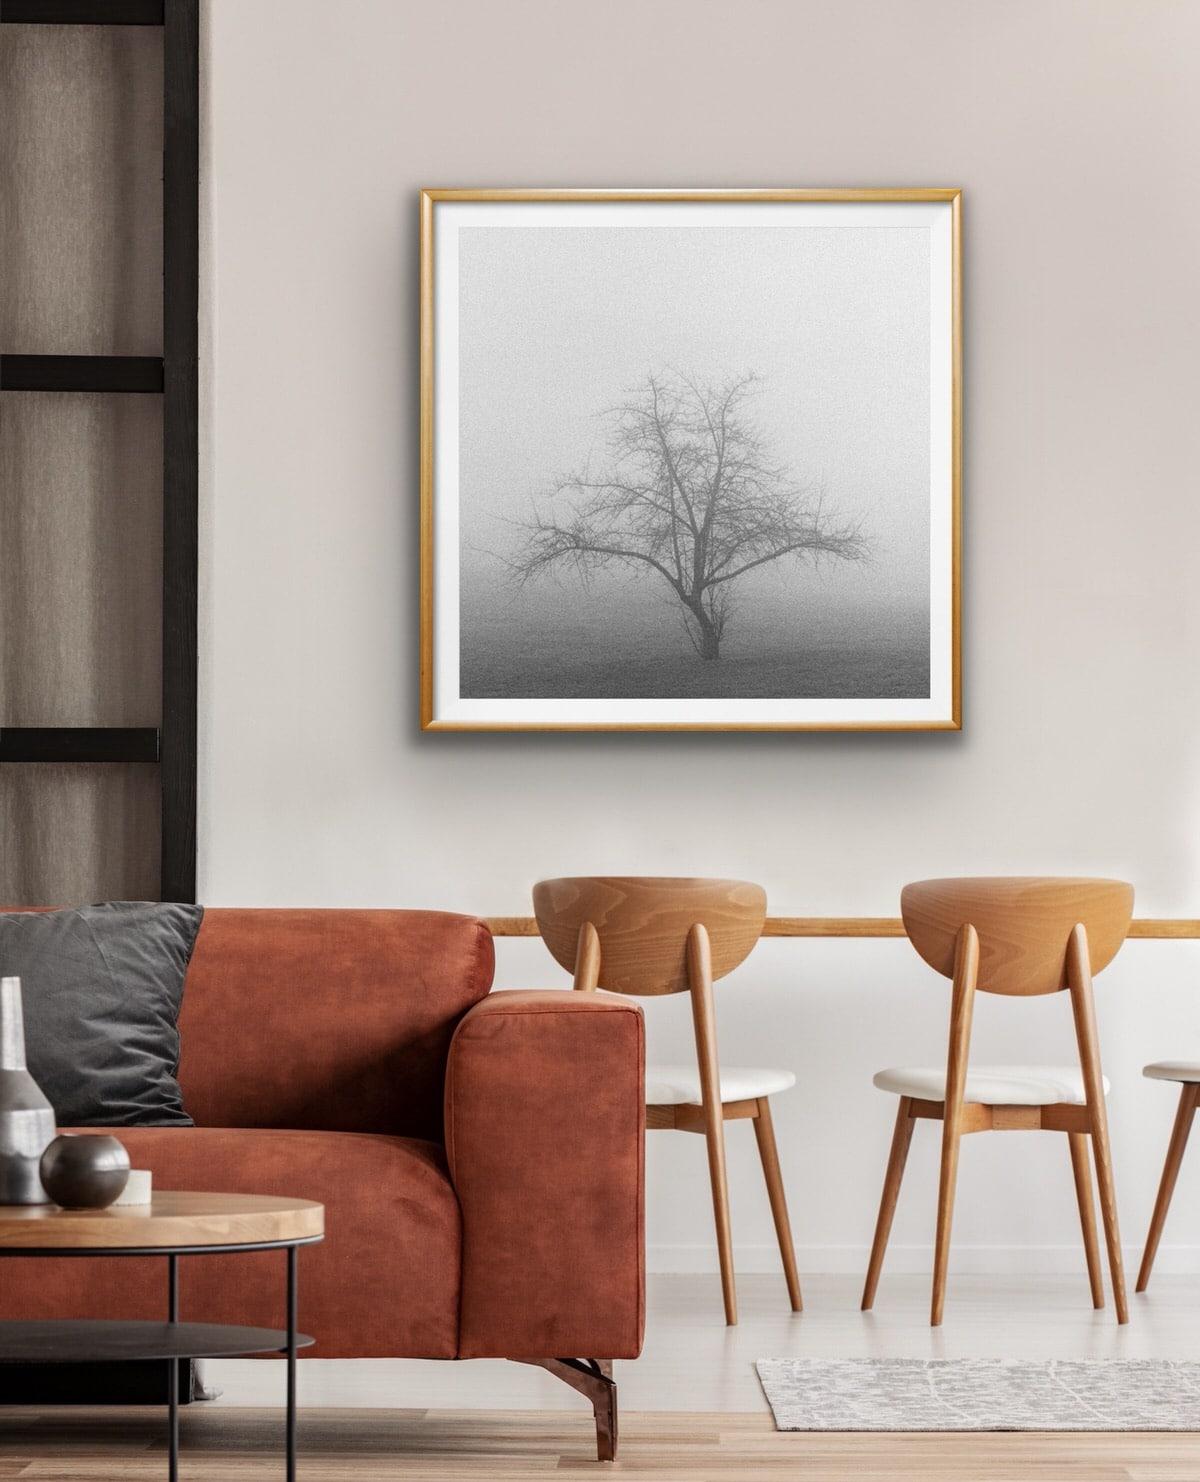 Black-and-white-fine-art-film-photography-wall-decor-by-emerging-artist-Studio-L-photographer-Laura-Schneider-_4900